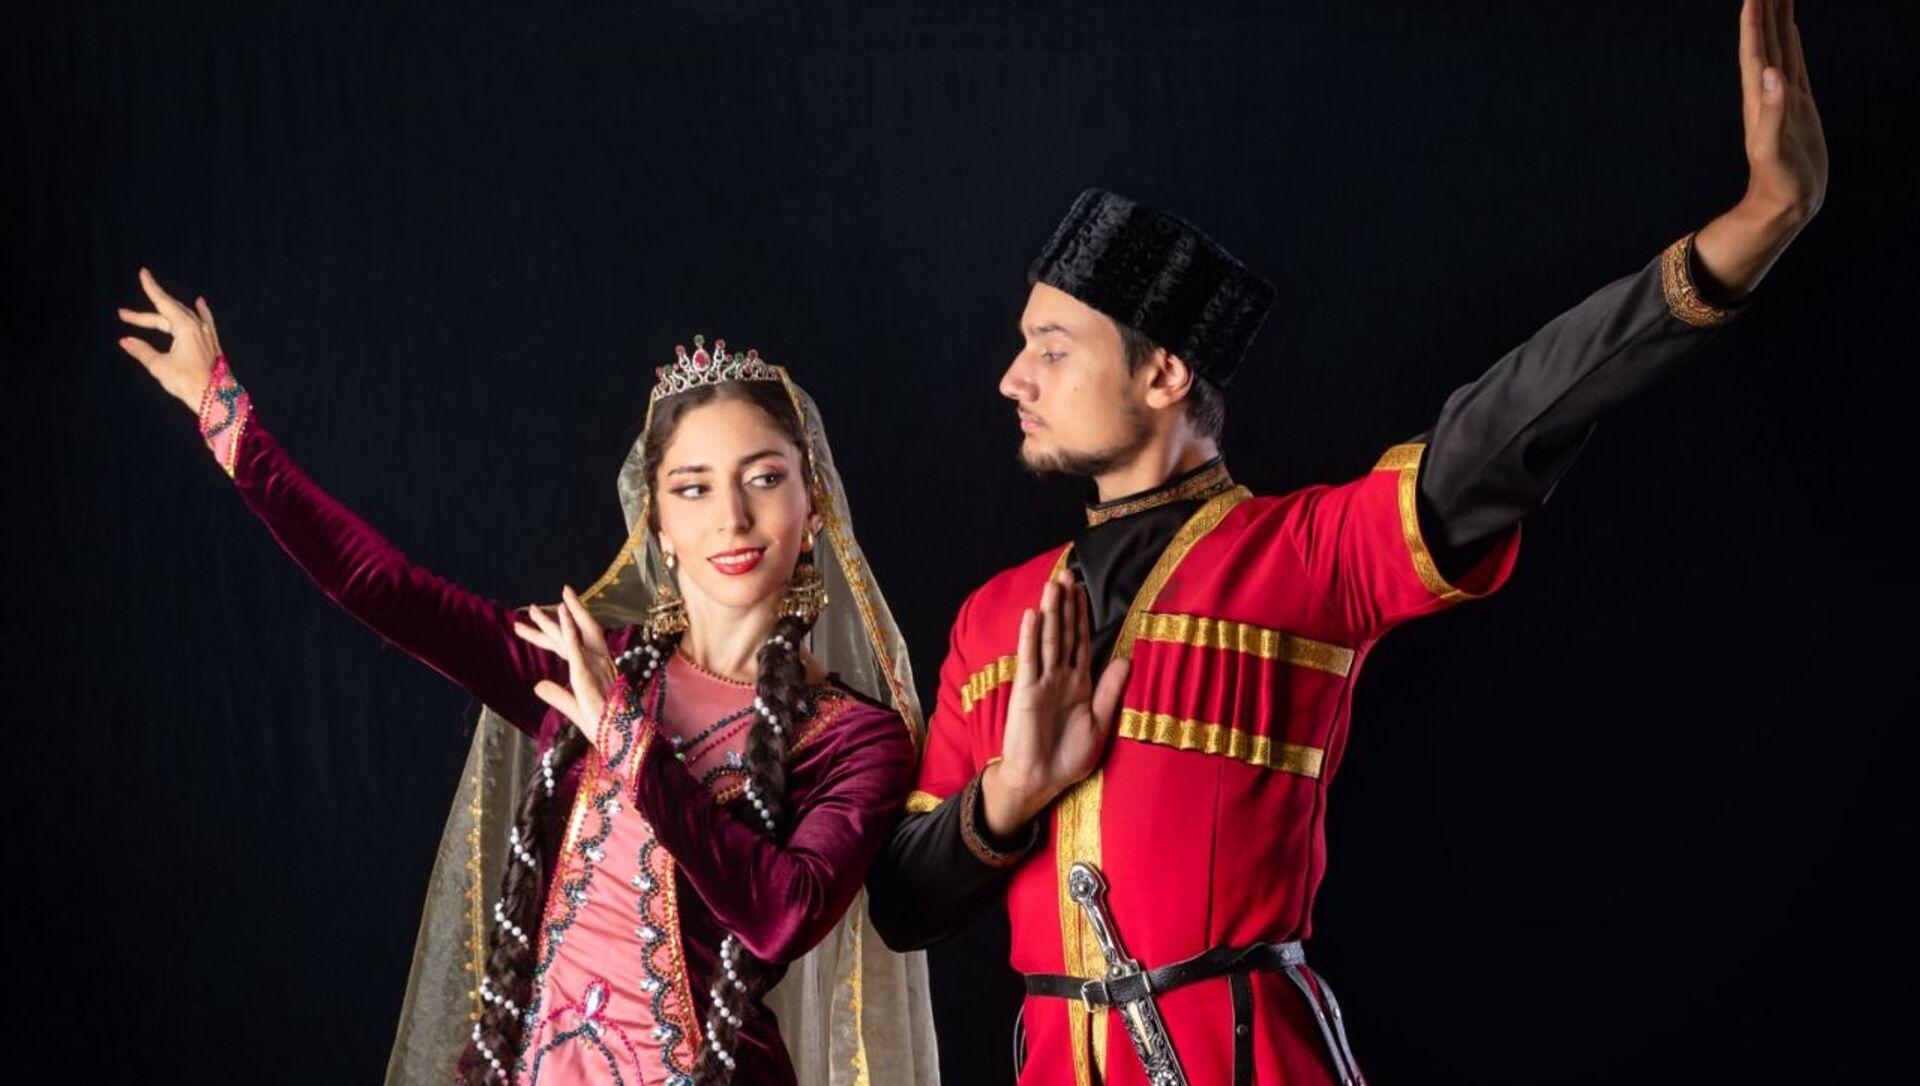 X Международный фестиваль народного творчества Золотое кольцо-2021 - Sputnik Азербайджан, 1920, 11.09.2021